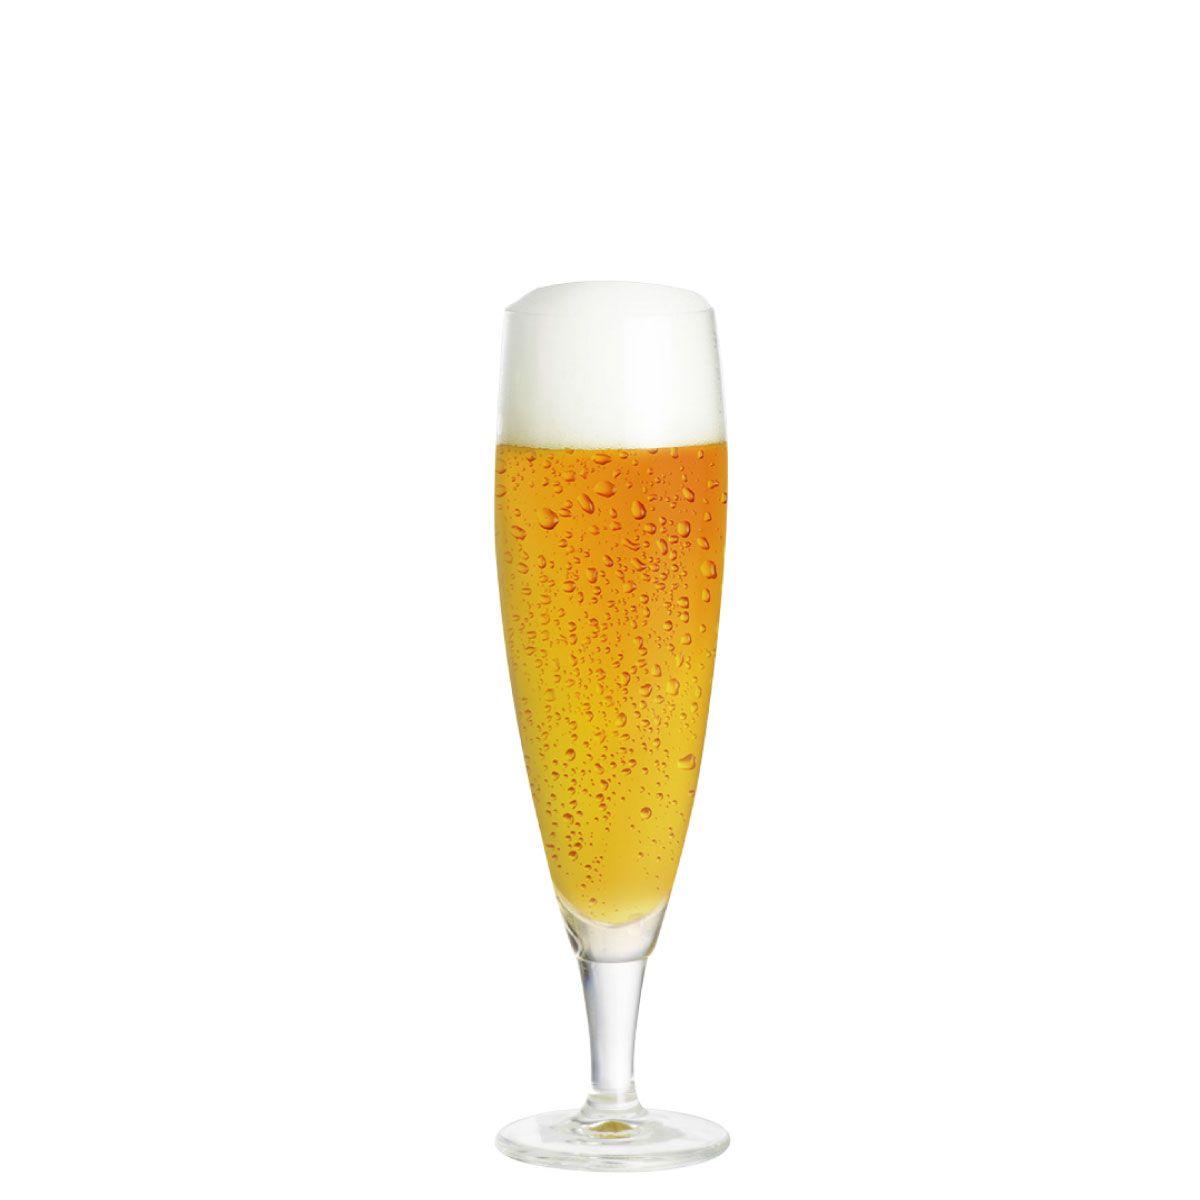 Taça de Cristal para Cerveja Sokata 325ml